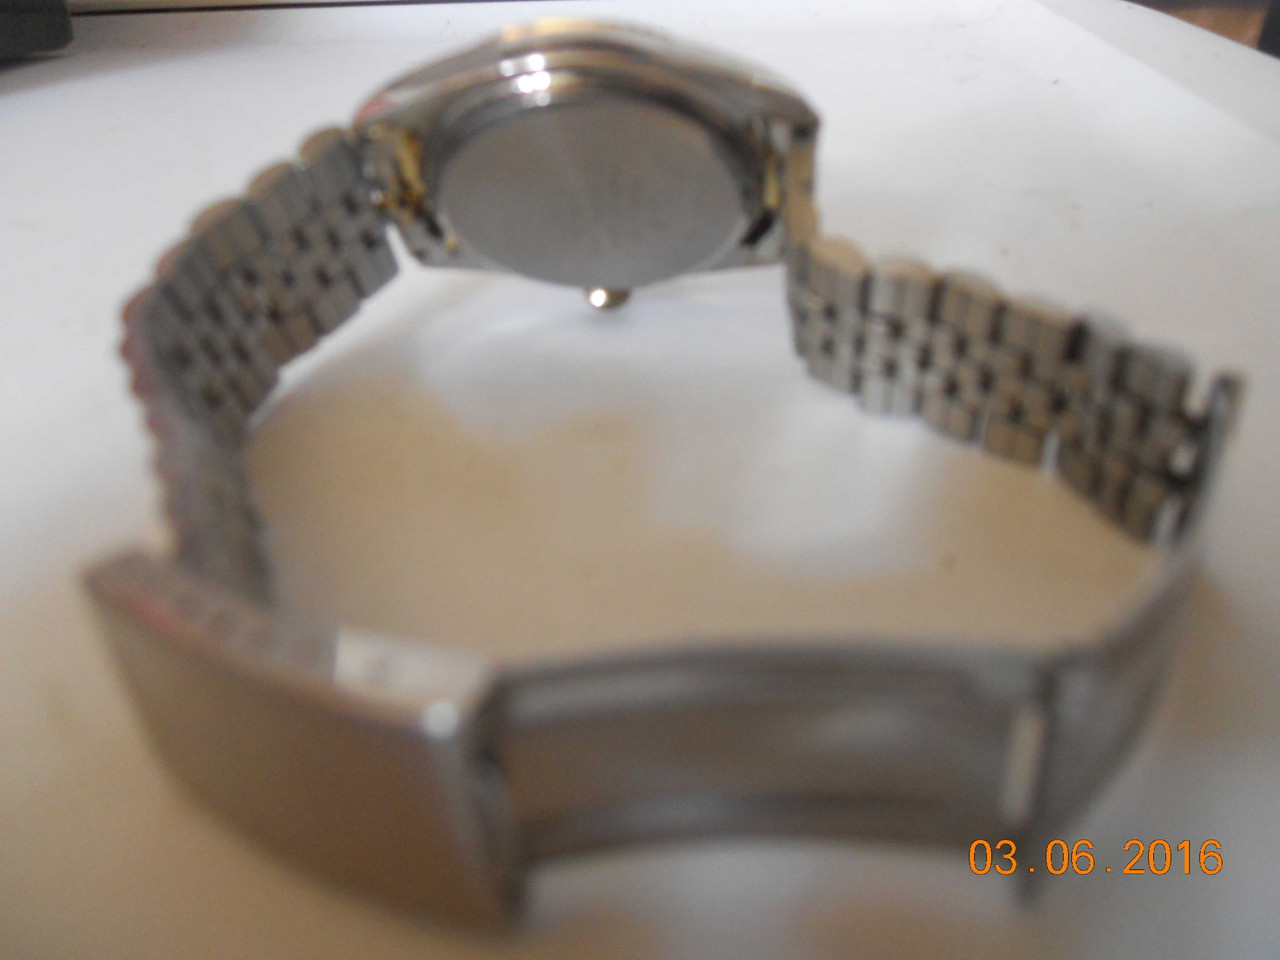 90d9622bbeb6 Men s SERGIO VALENTE WATCH Stainless   Gold tones w  Diamond chip ...